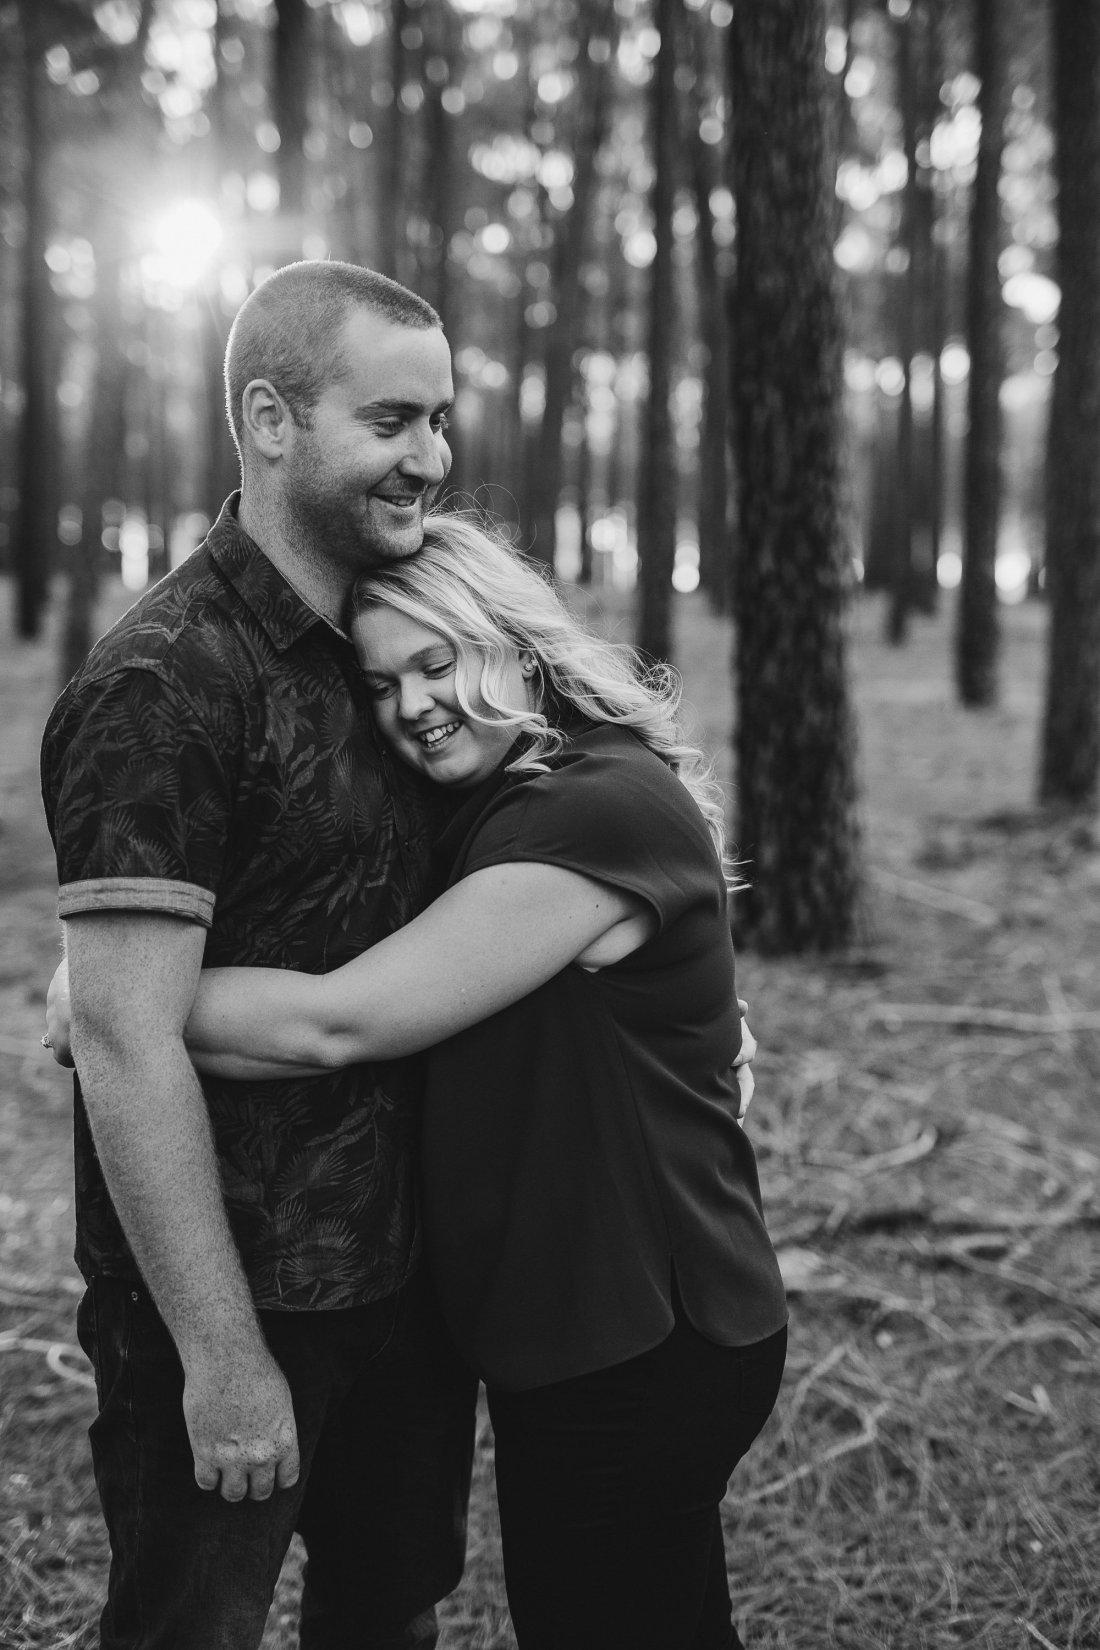 Perth Wedding Photographer | Pines Forrest Engagment | Ebony Blush Photography | Corry + Reece | Pre Wedding63